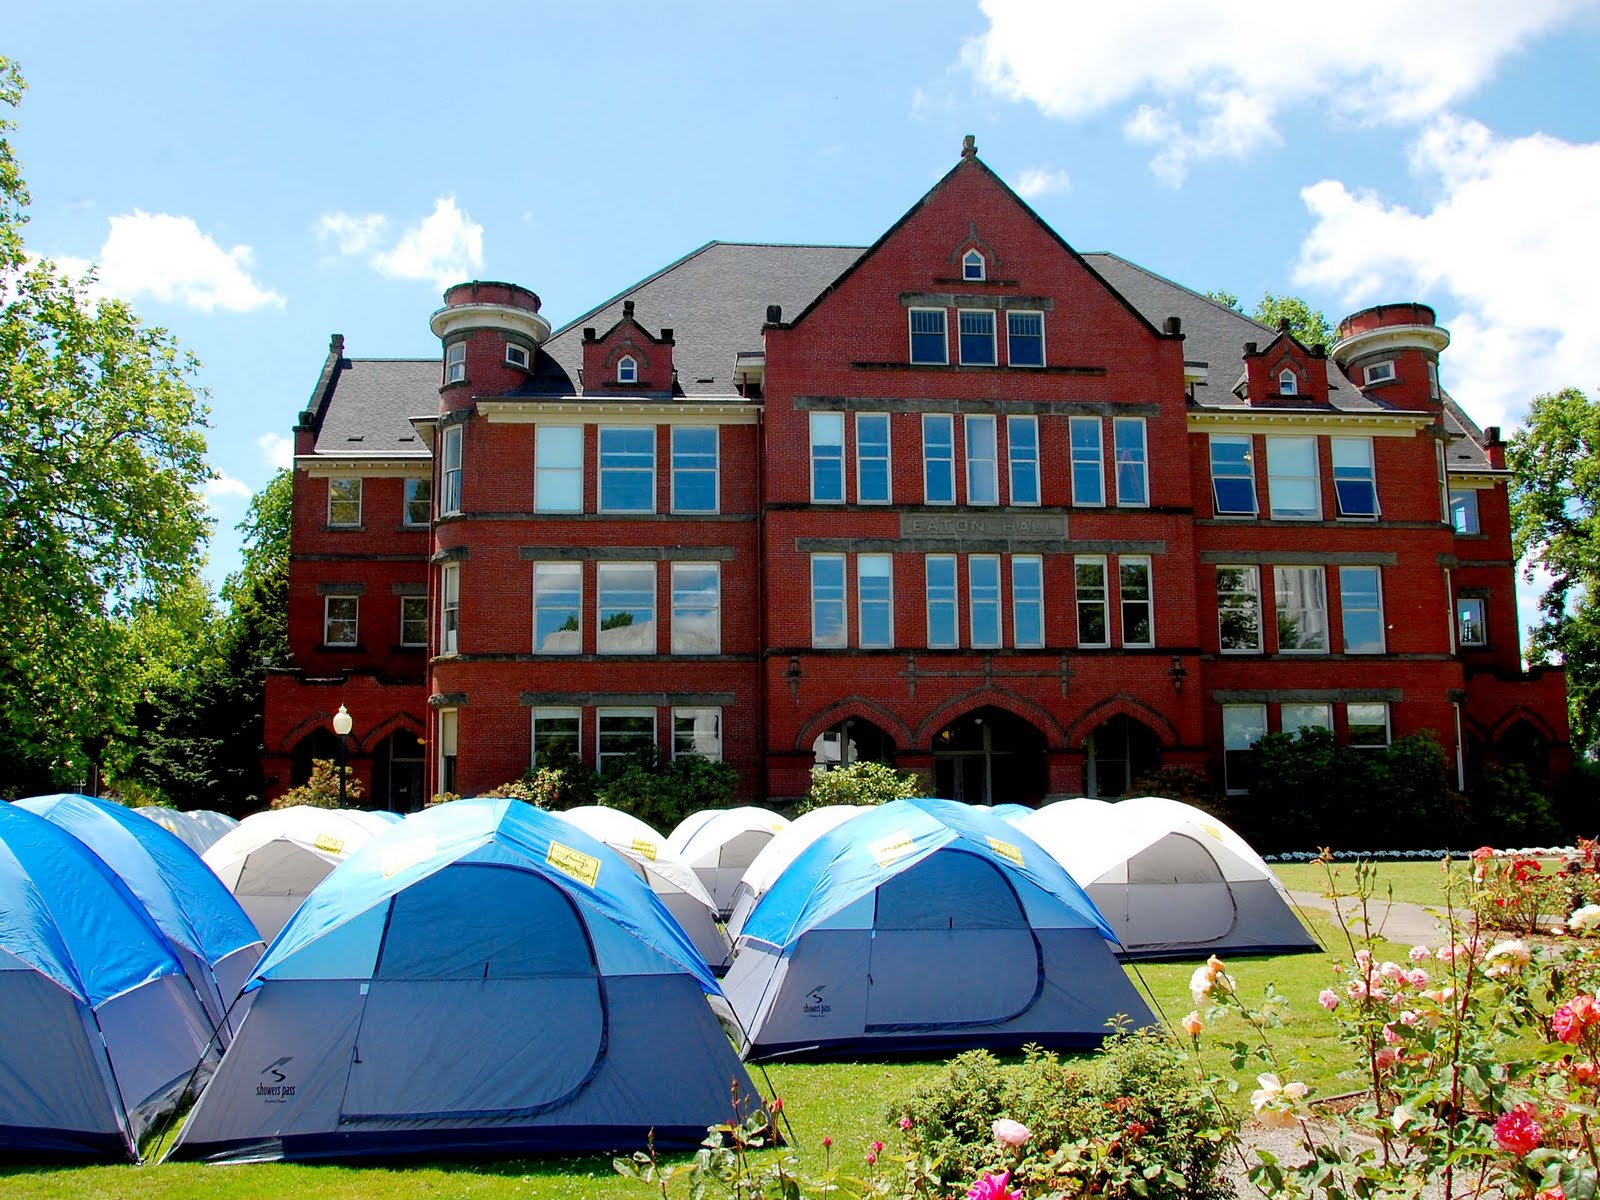 Salem, Oregon Daily Photo Diary: Tent City